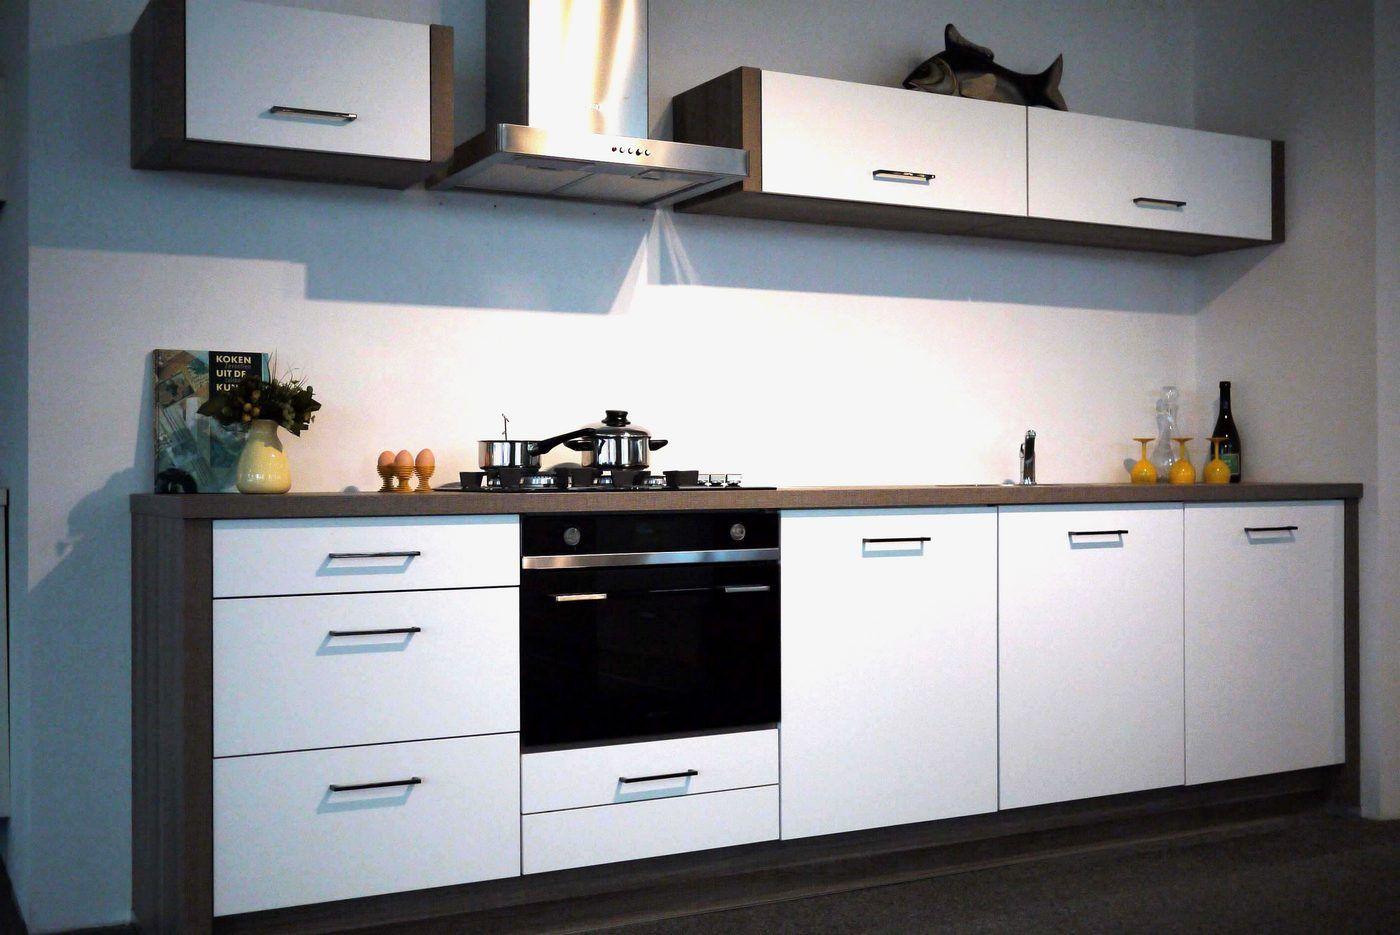 Keuken Wit Mat : Altijd de beste keukenprijs! Rechte keuken wit mat lak X07 [55608